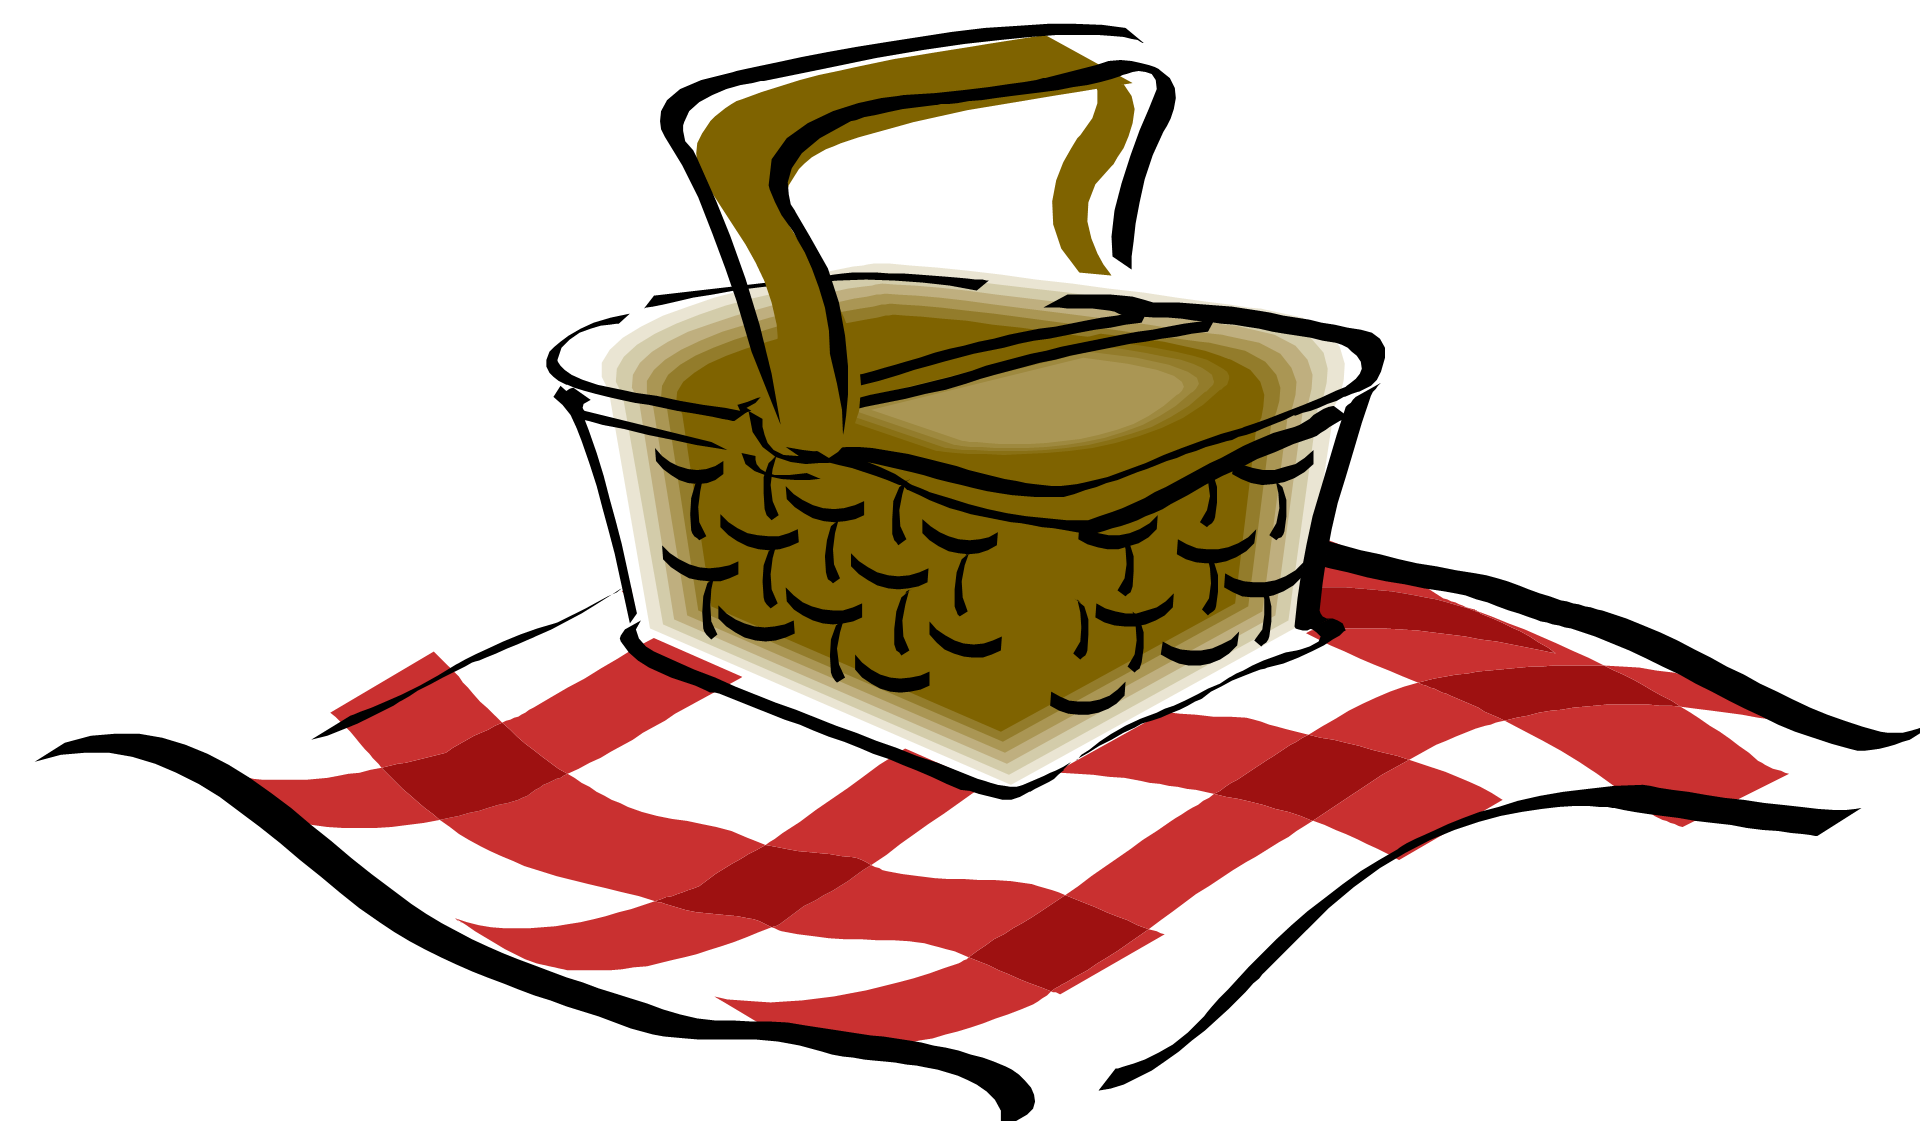 Cartoon Picnic Basket Png